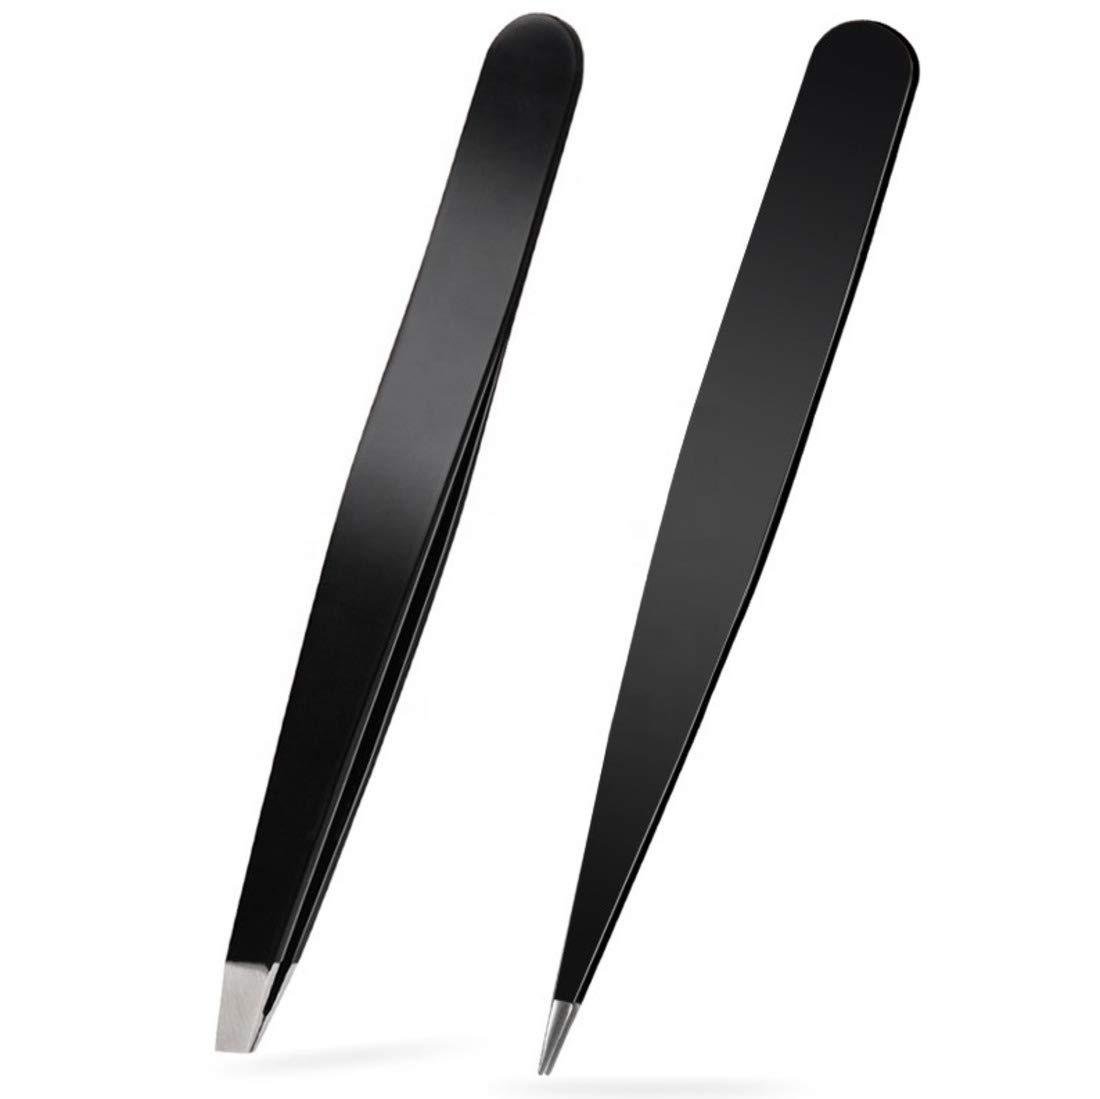 Tweezers Set - Stainless Steel Slant Tip and Pointed Tweezers for Eyebrow, Facial Hair, Ingrown Hair, Splinter, Blackhead and Tick Remover